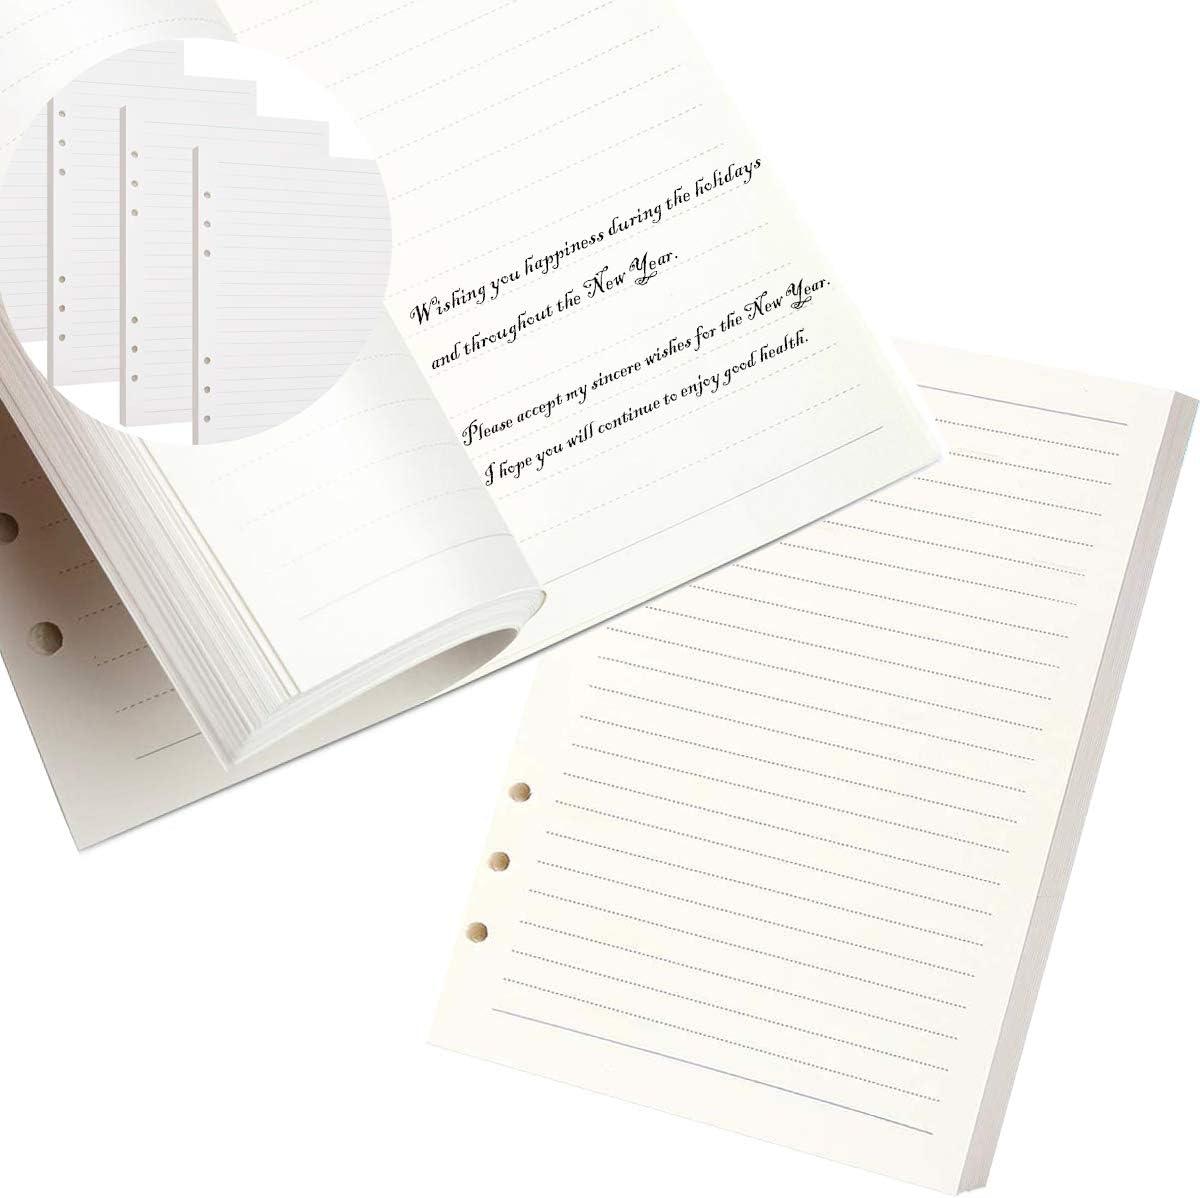 Nachf/üllpapier Leere Nachf/üllseiten Refill Paper Ersatzbl/ätter 6 L/öcher 180 Bl/ätter Nachf/üllbare Refill Paper Nachf/ülleinlagen A5 Papier Horizontale Linie